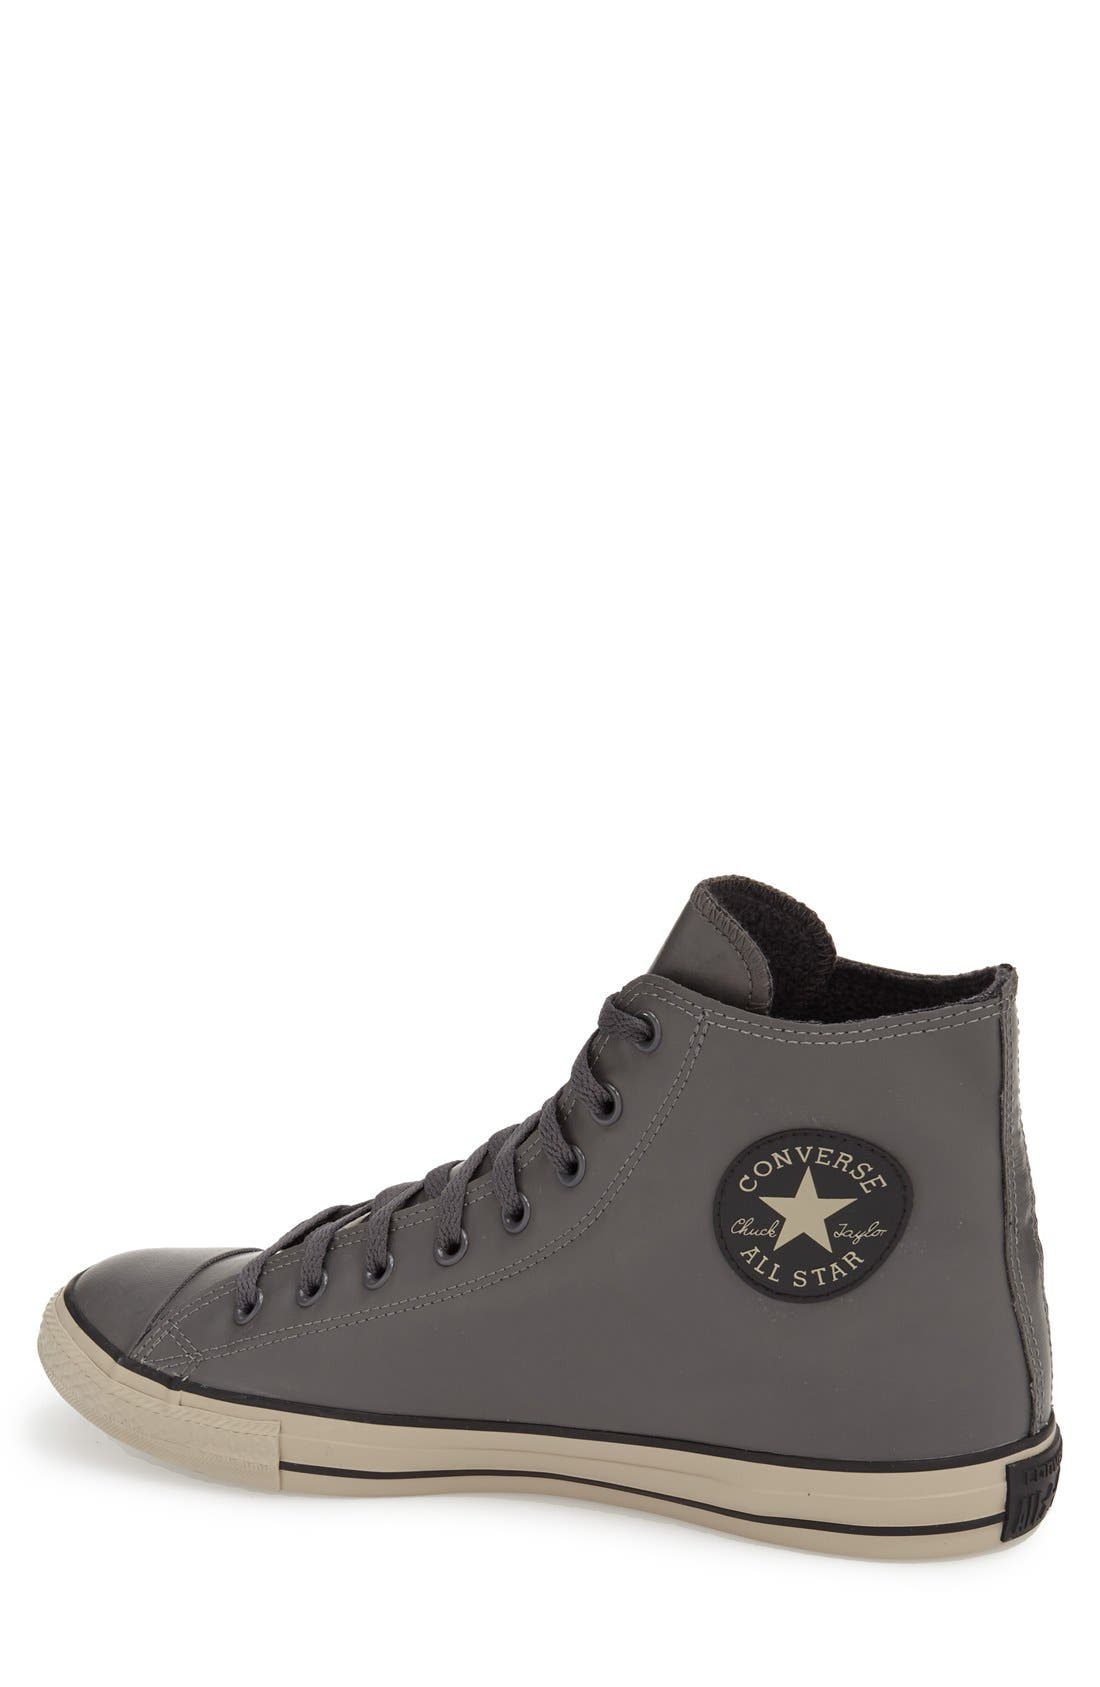 Alternate Image 2  - Converse Chuck Taylor® All Star® Rubber High Top Sneaker (Men)